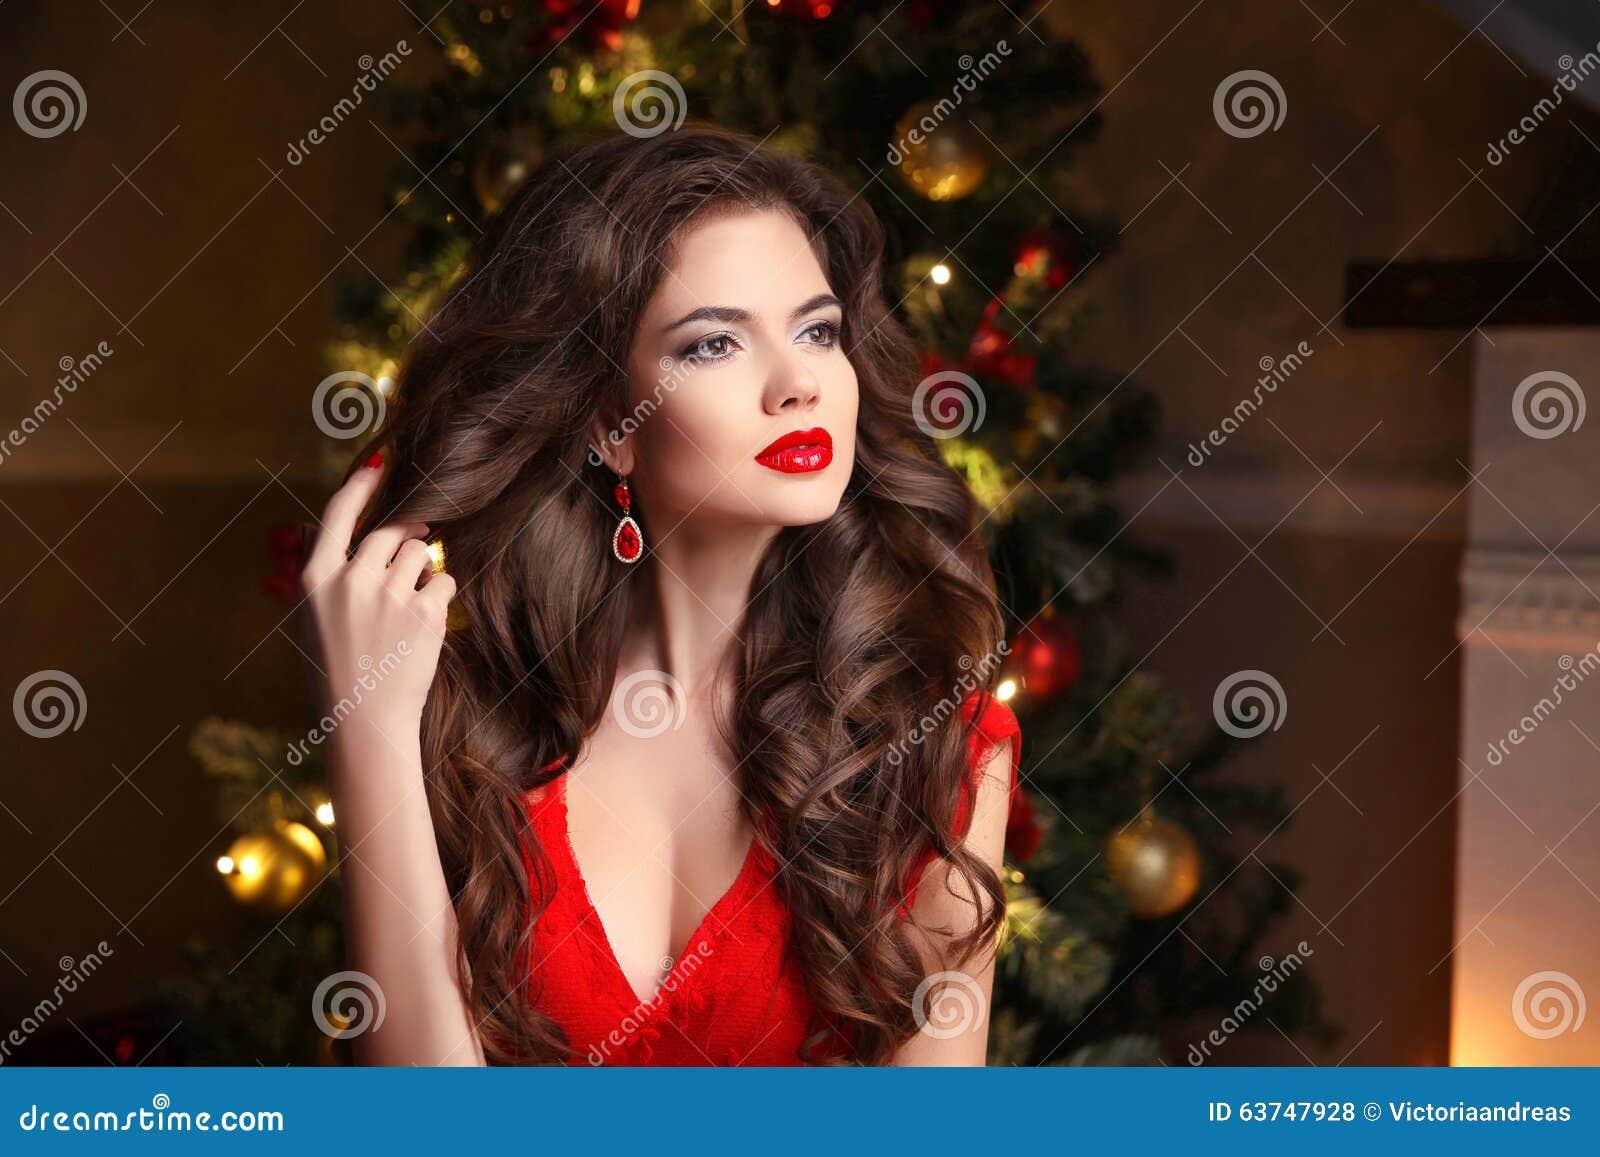 Christmas Hairstyles For Black Hair.Long Hair Makeup Christmas Woman Beautiful Girl Portrait